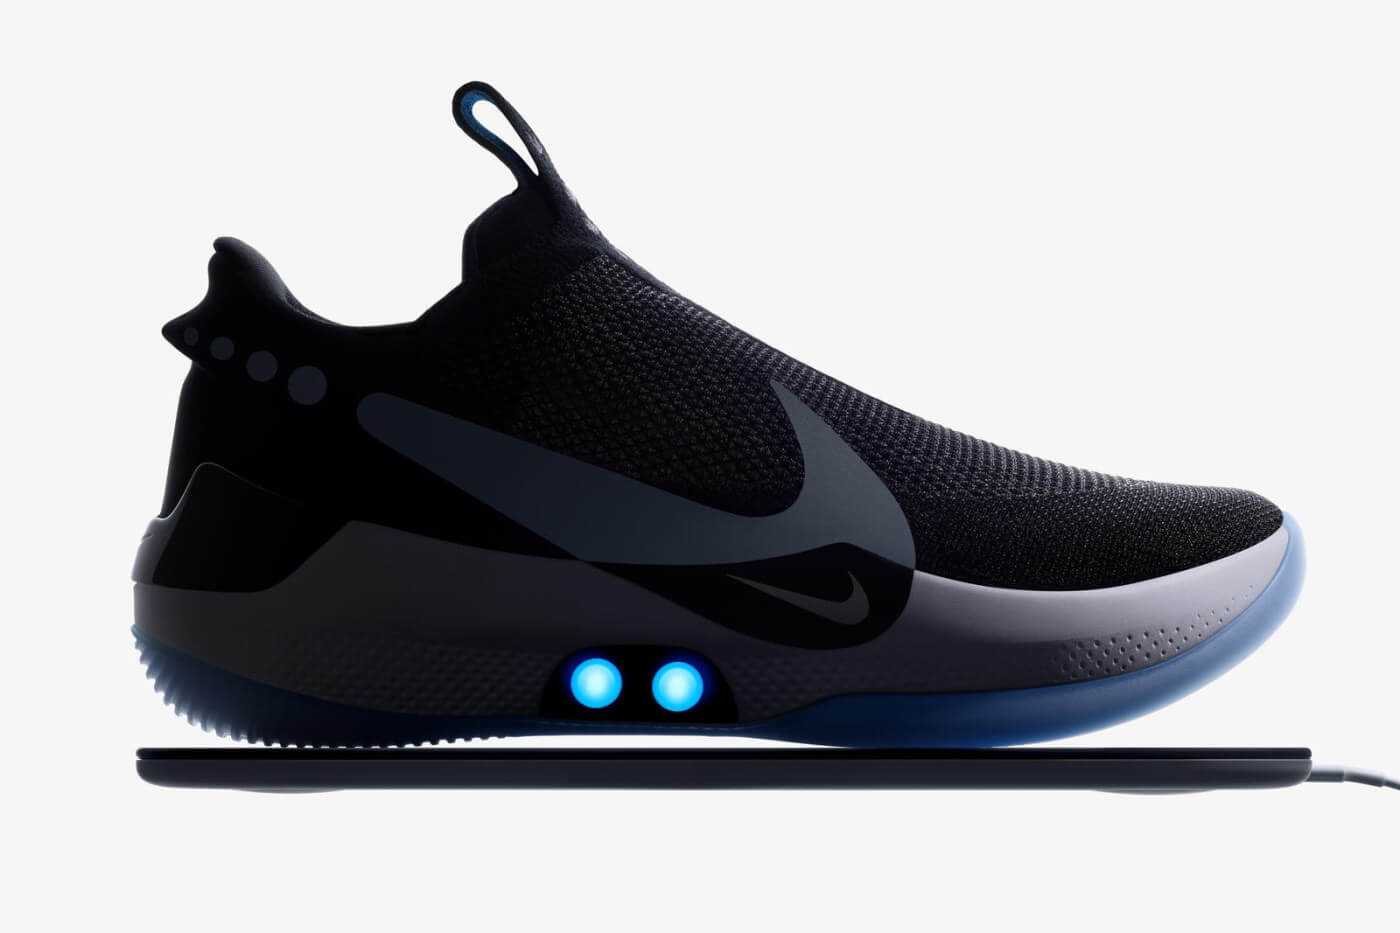 NIKE 正式发布自动系带篮球鞋 Adapt BB,它已经完成了在 NBA 的首秀